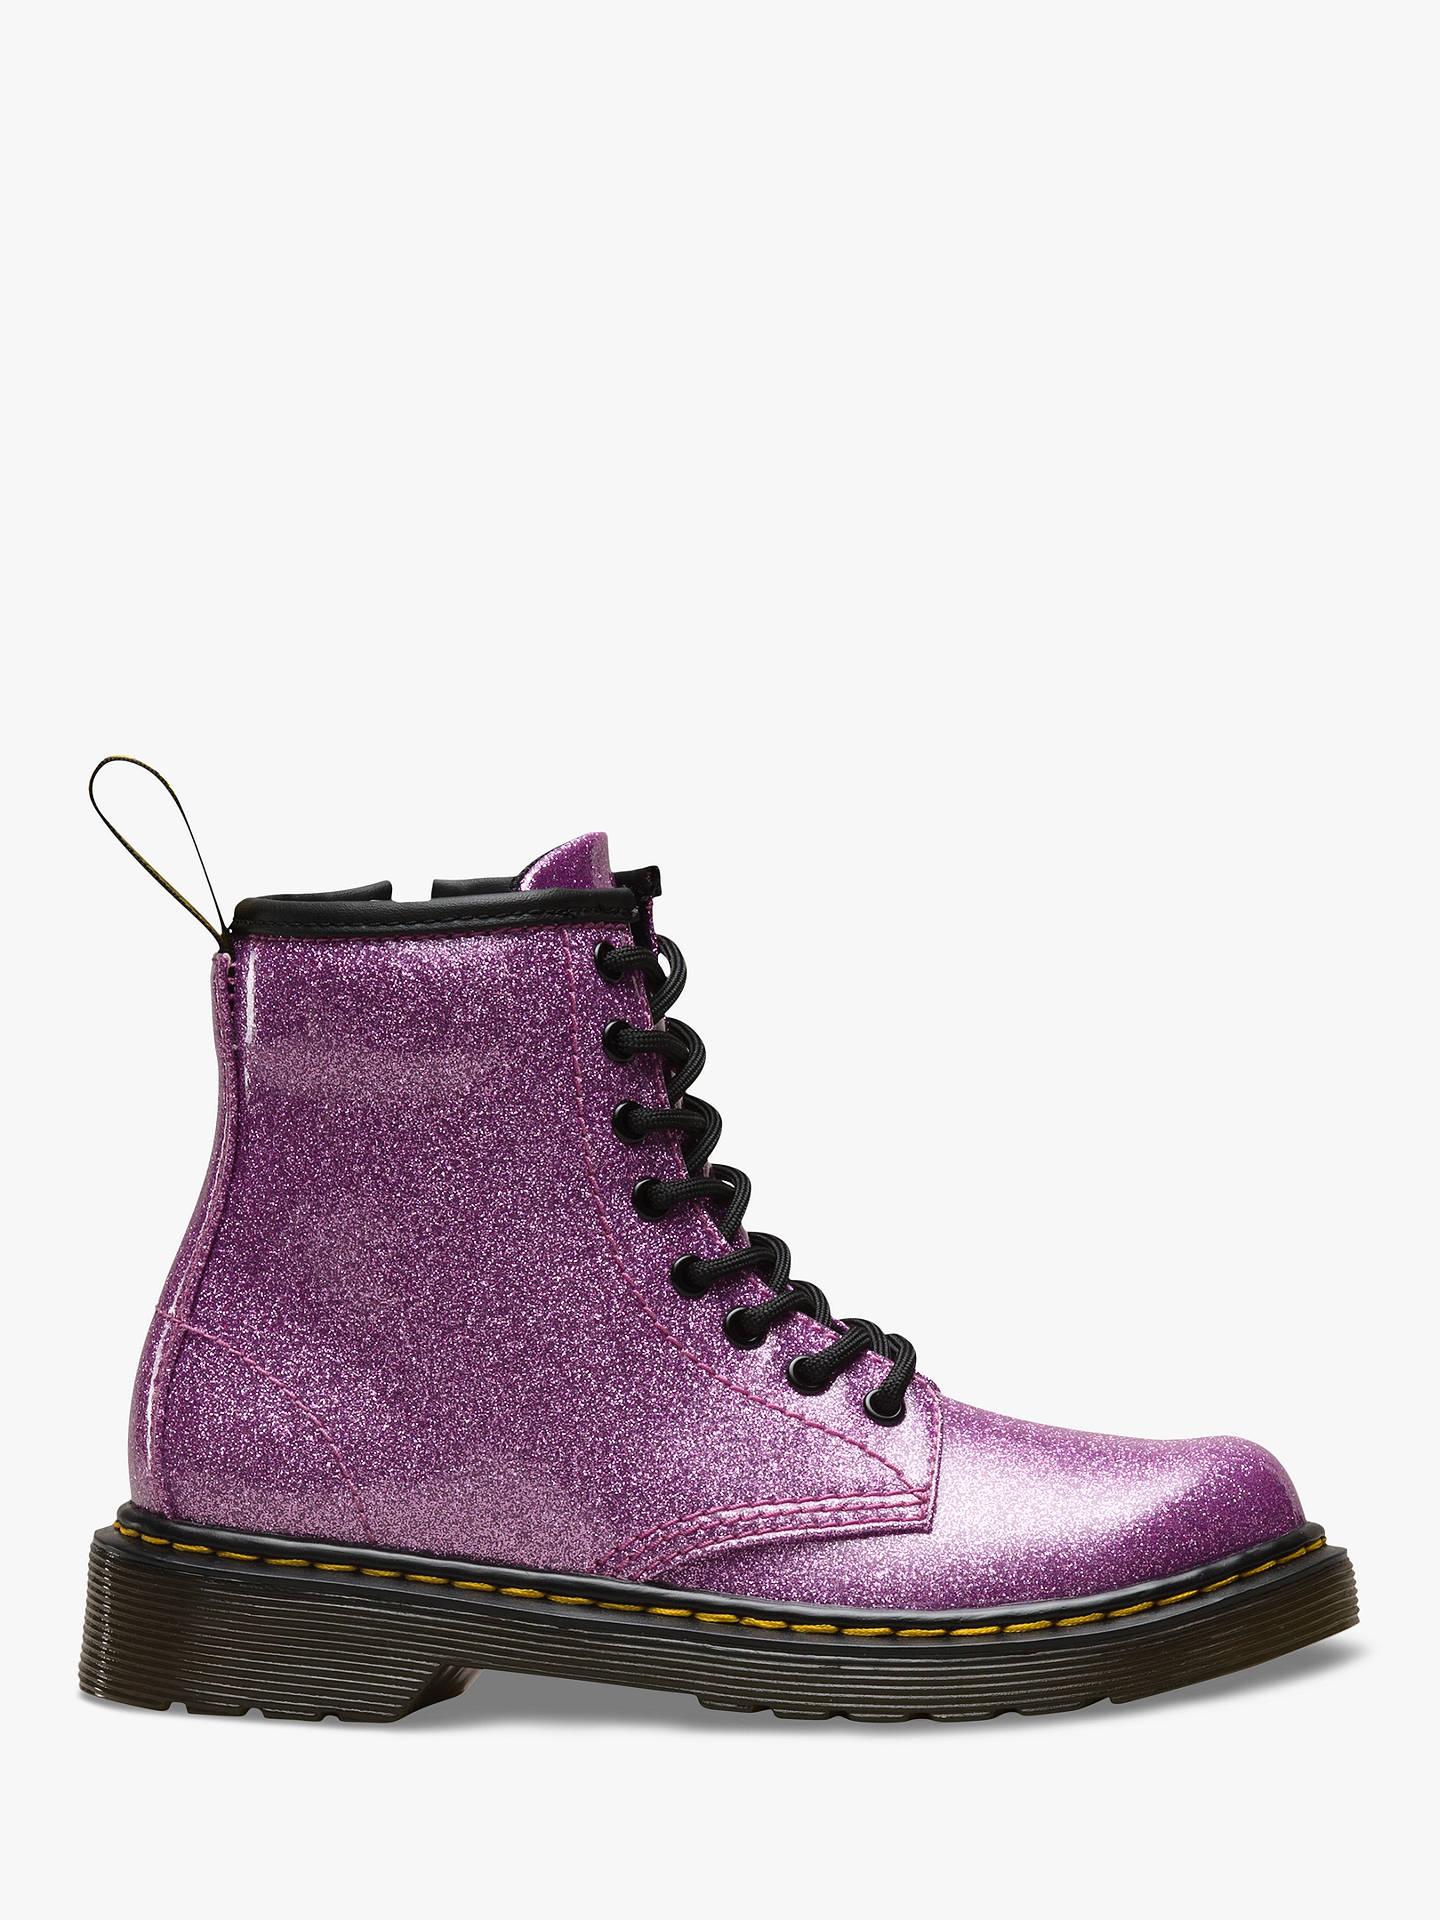 5746b81df9 Dr Martens Glitter Boots at John Lewis & Partners